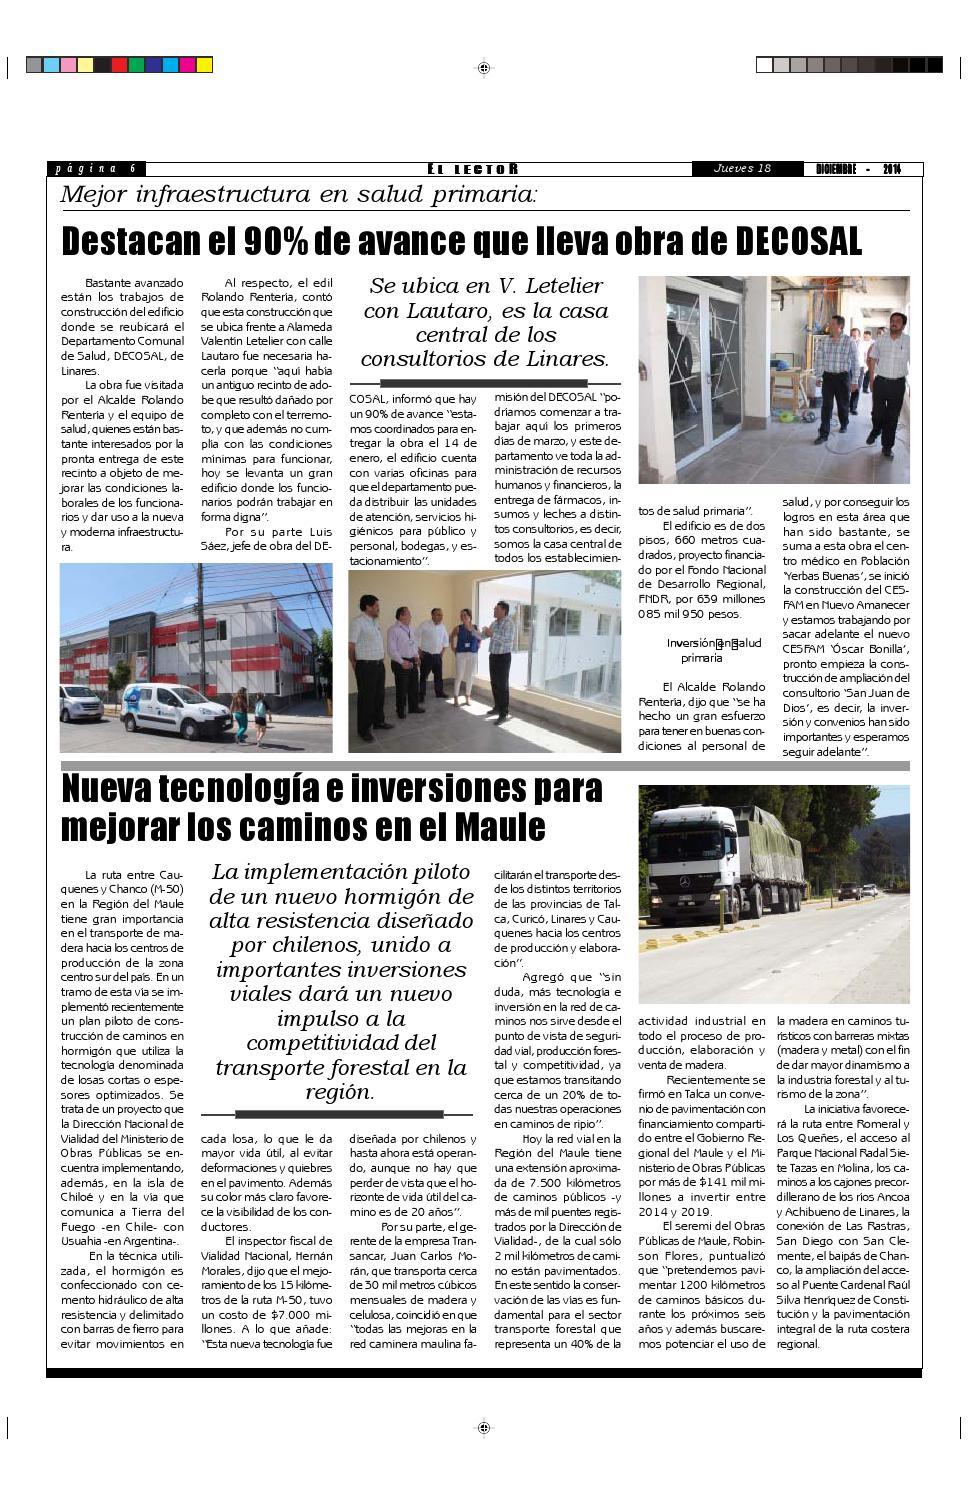 5a3e0403b86 Jueves 18 de diciembre 2014 by Diario El Lector del maule - issuu